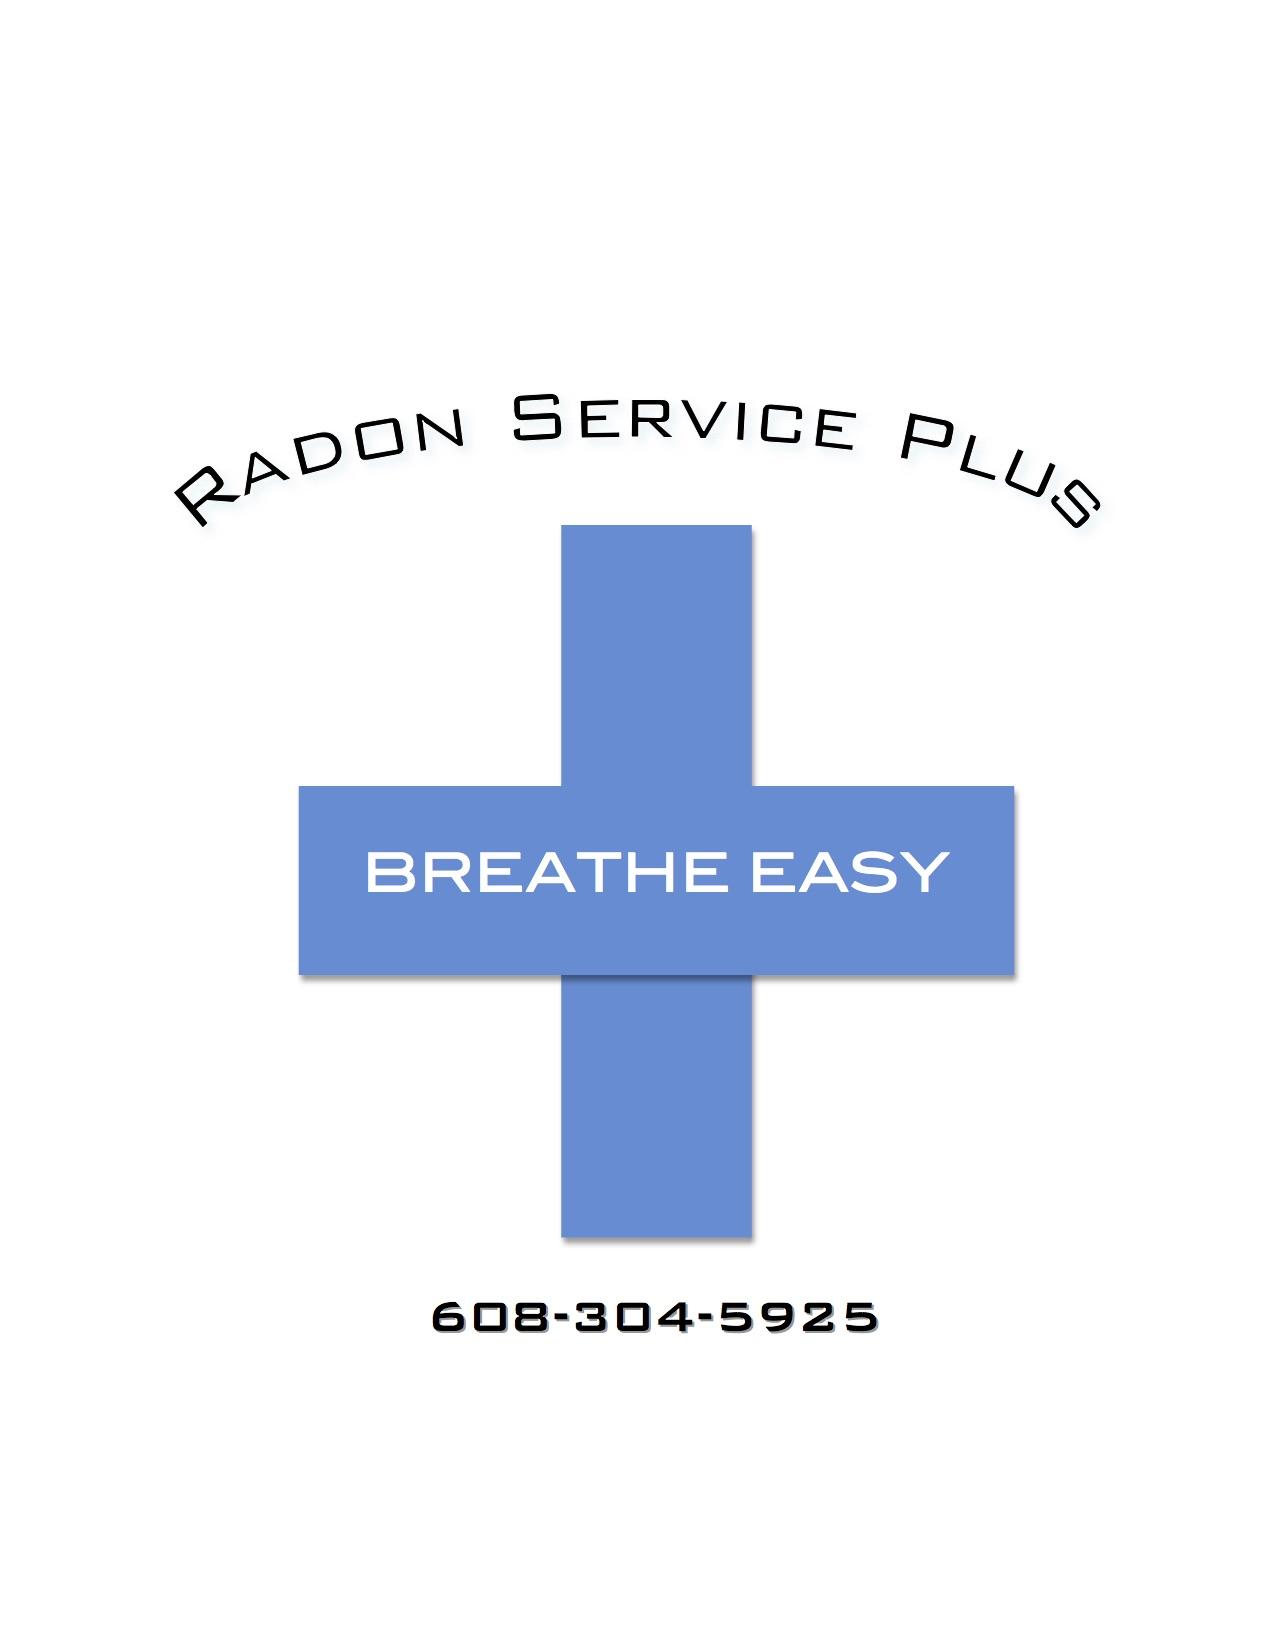 Radon Service Plus Logo